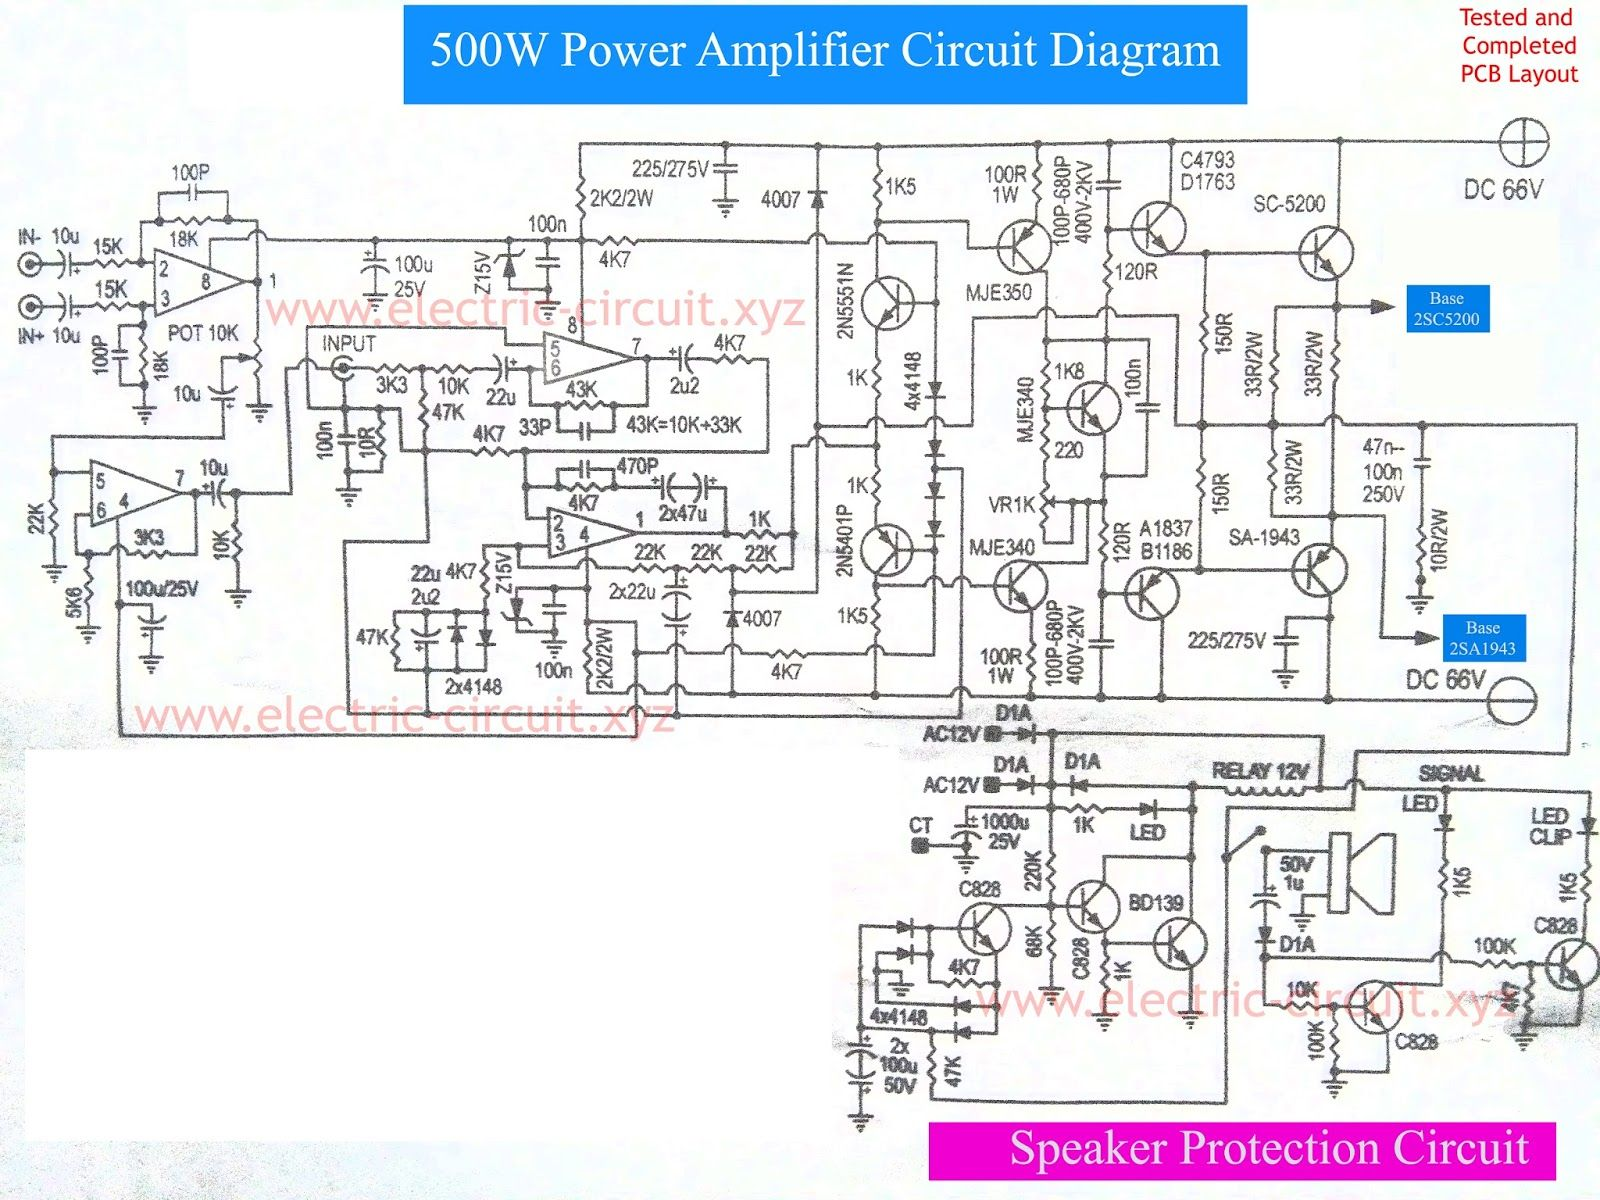 5000 Watt Amplifier Circuit Diagram John Deere 2305 Wiring Power 500w With Speaker Protection